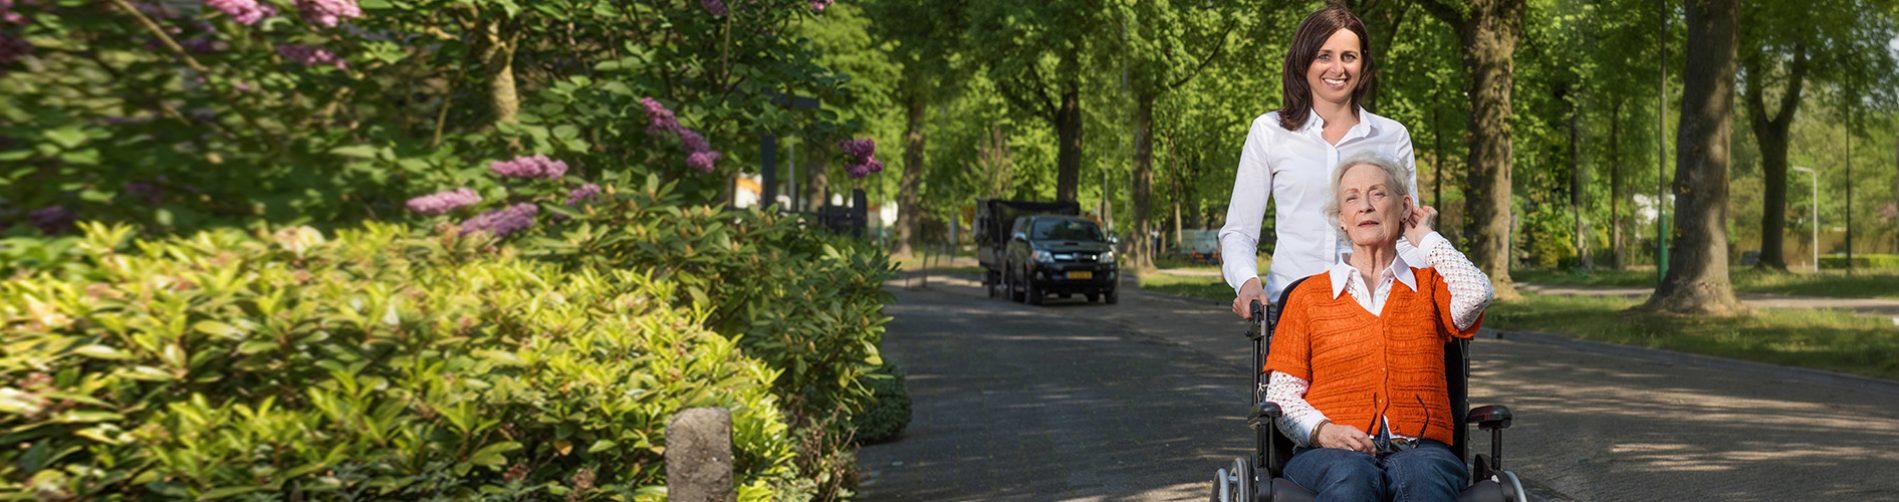 Particuliere Thuiszorg Nederland ouderenzorg - header v2